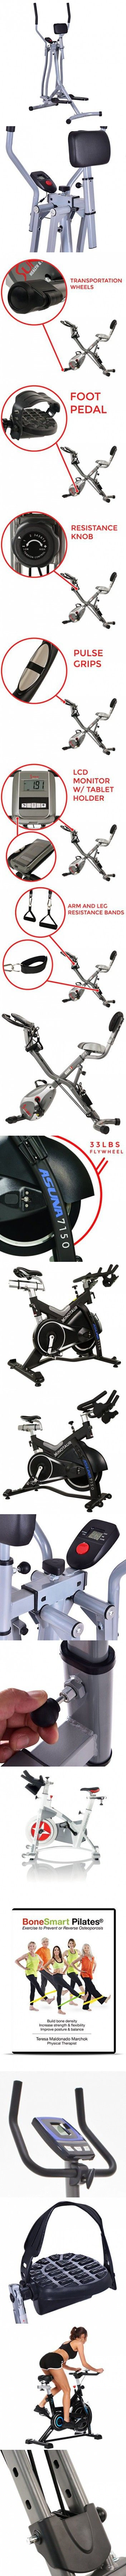 Indoor Air Walker Glider Fitness Exercise Machine